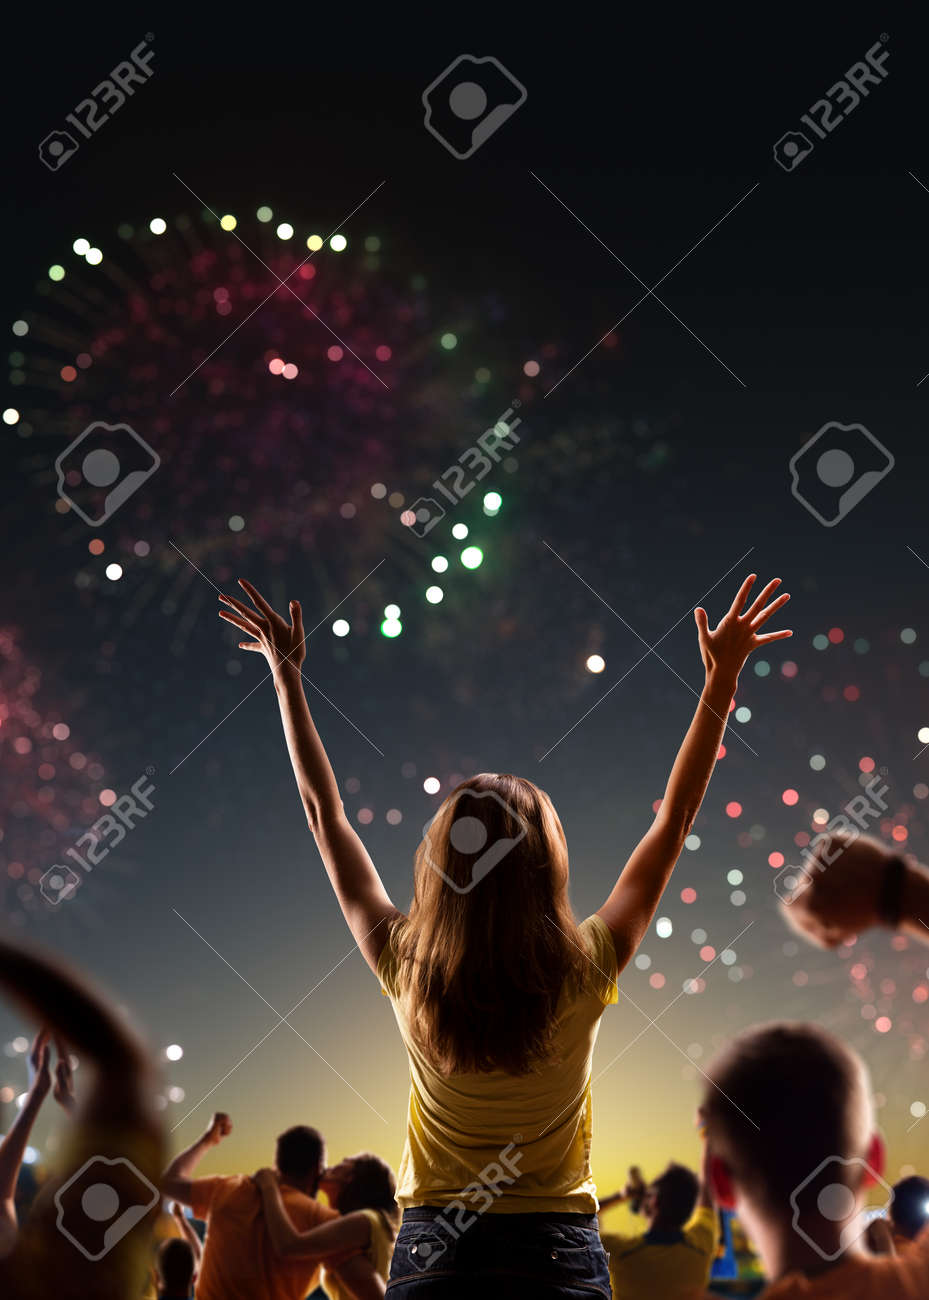 Fans celebrate in Stadium Arena night fireworks - 157252388